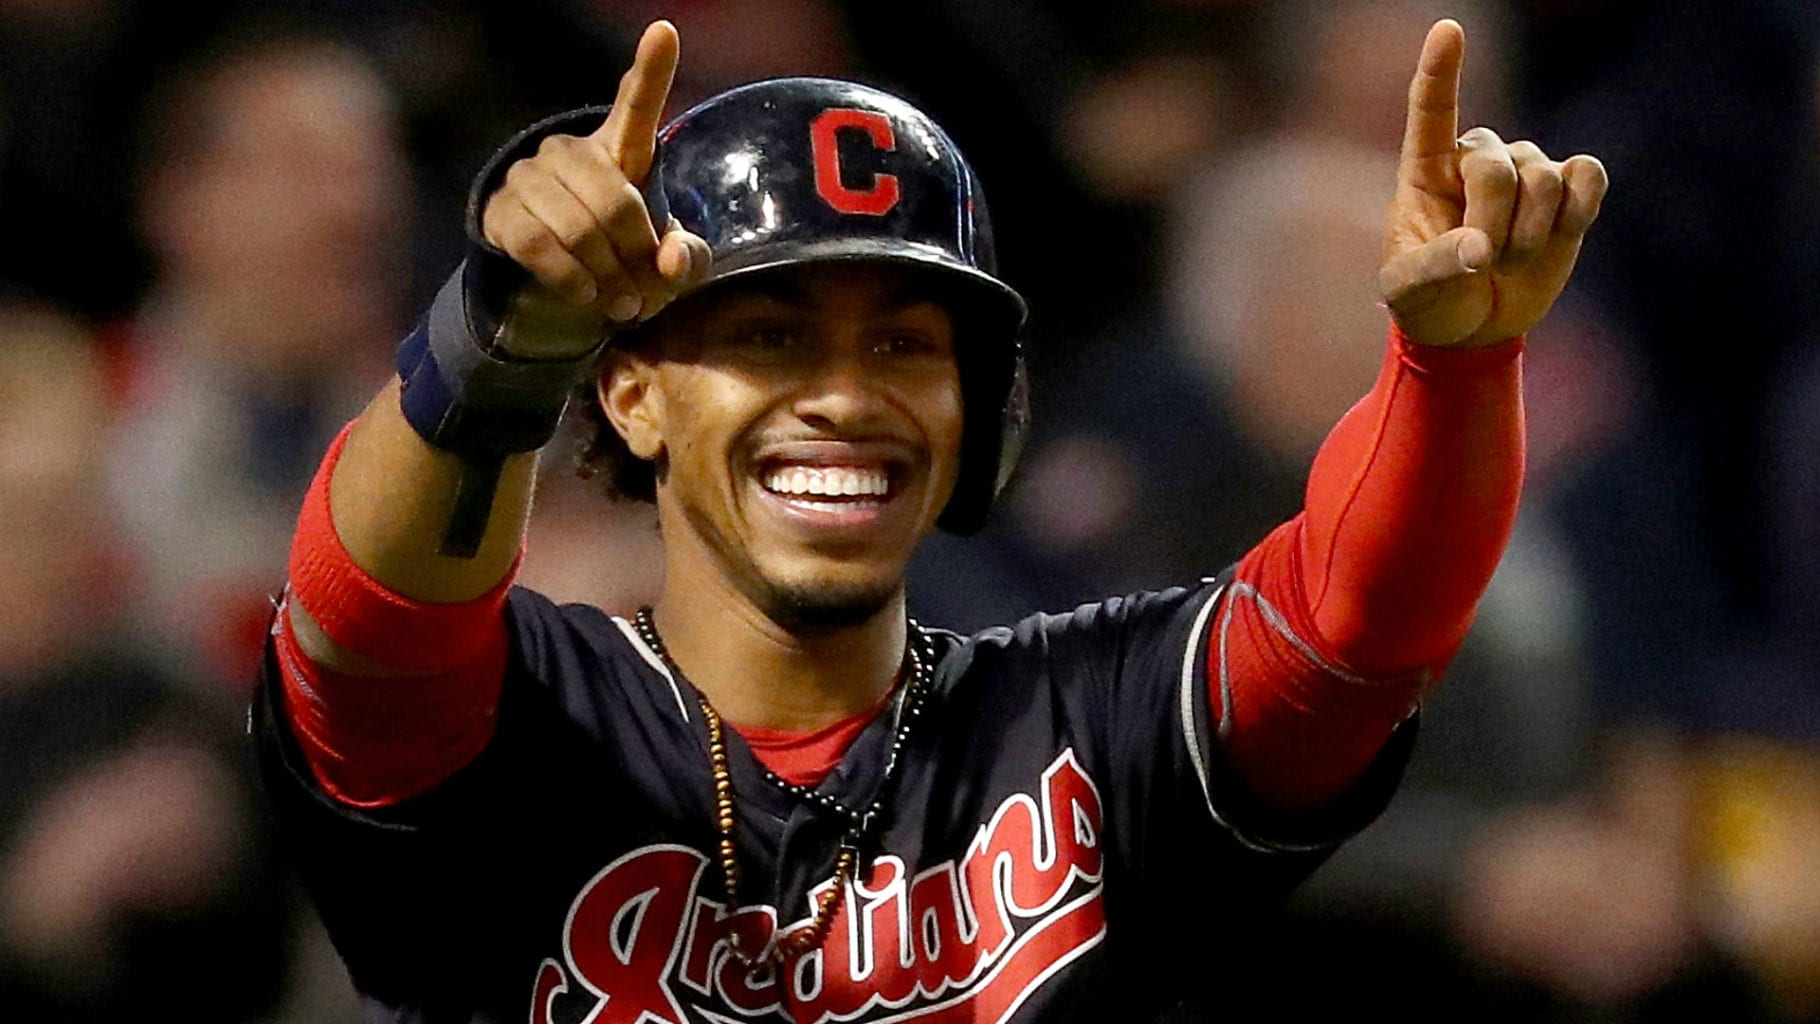 Cleveland Indians winning streak